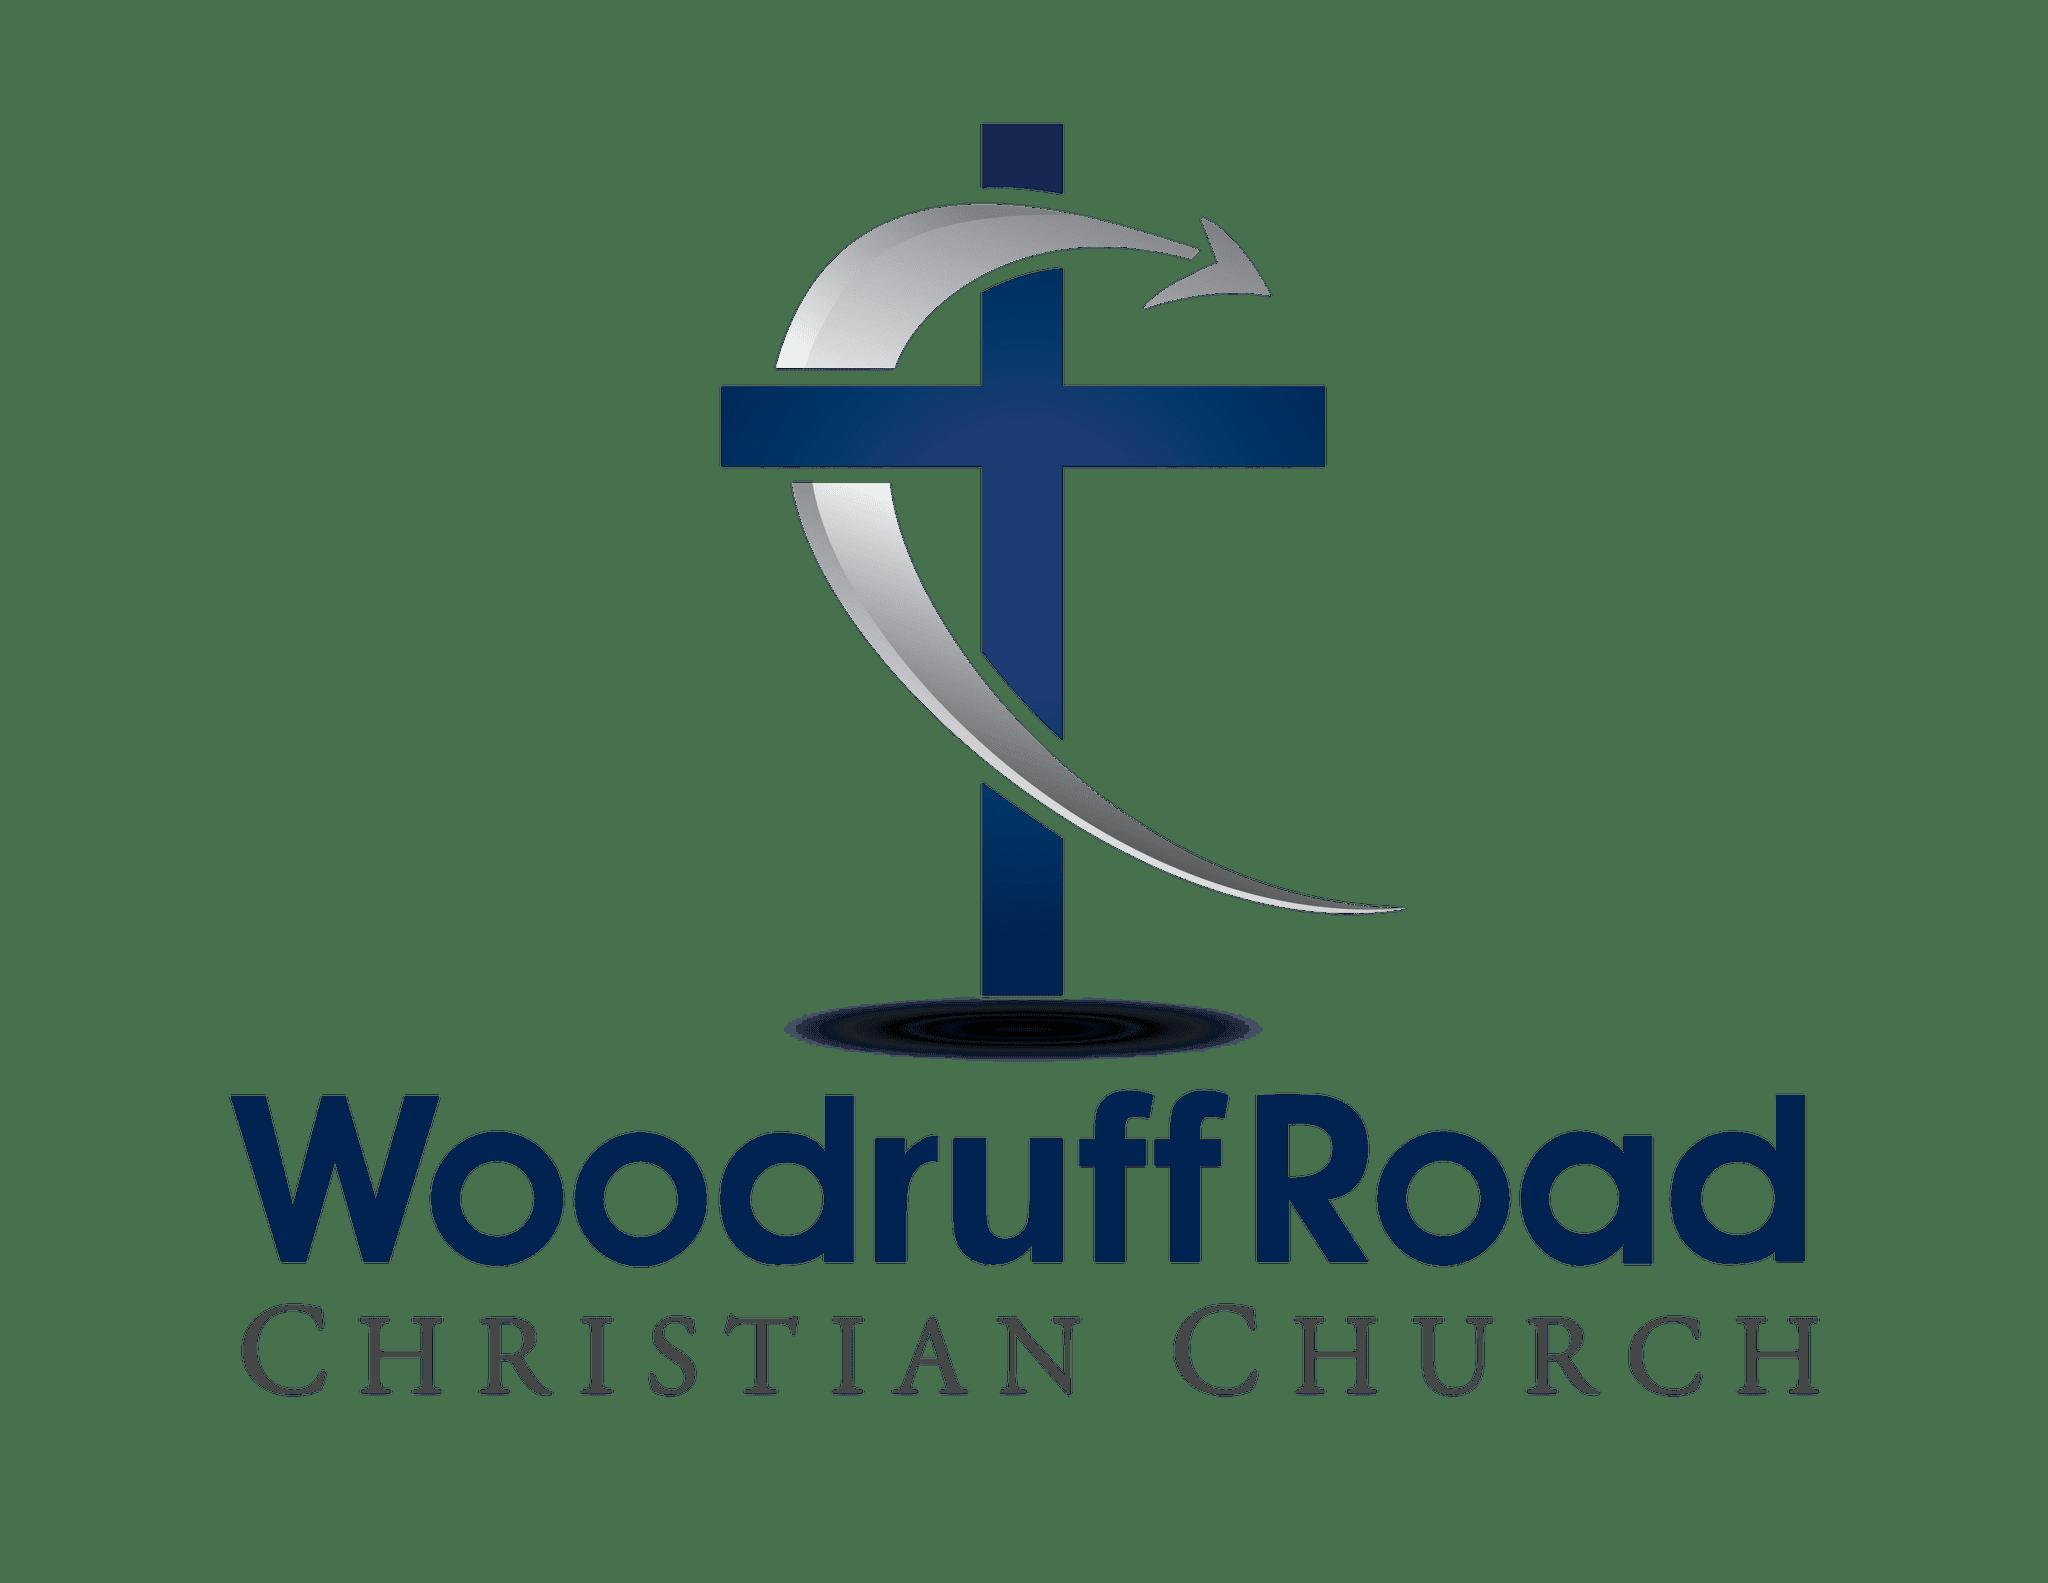 Woodruff Road Christian Church Foodbank